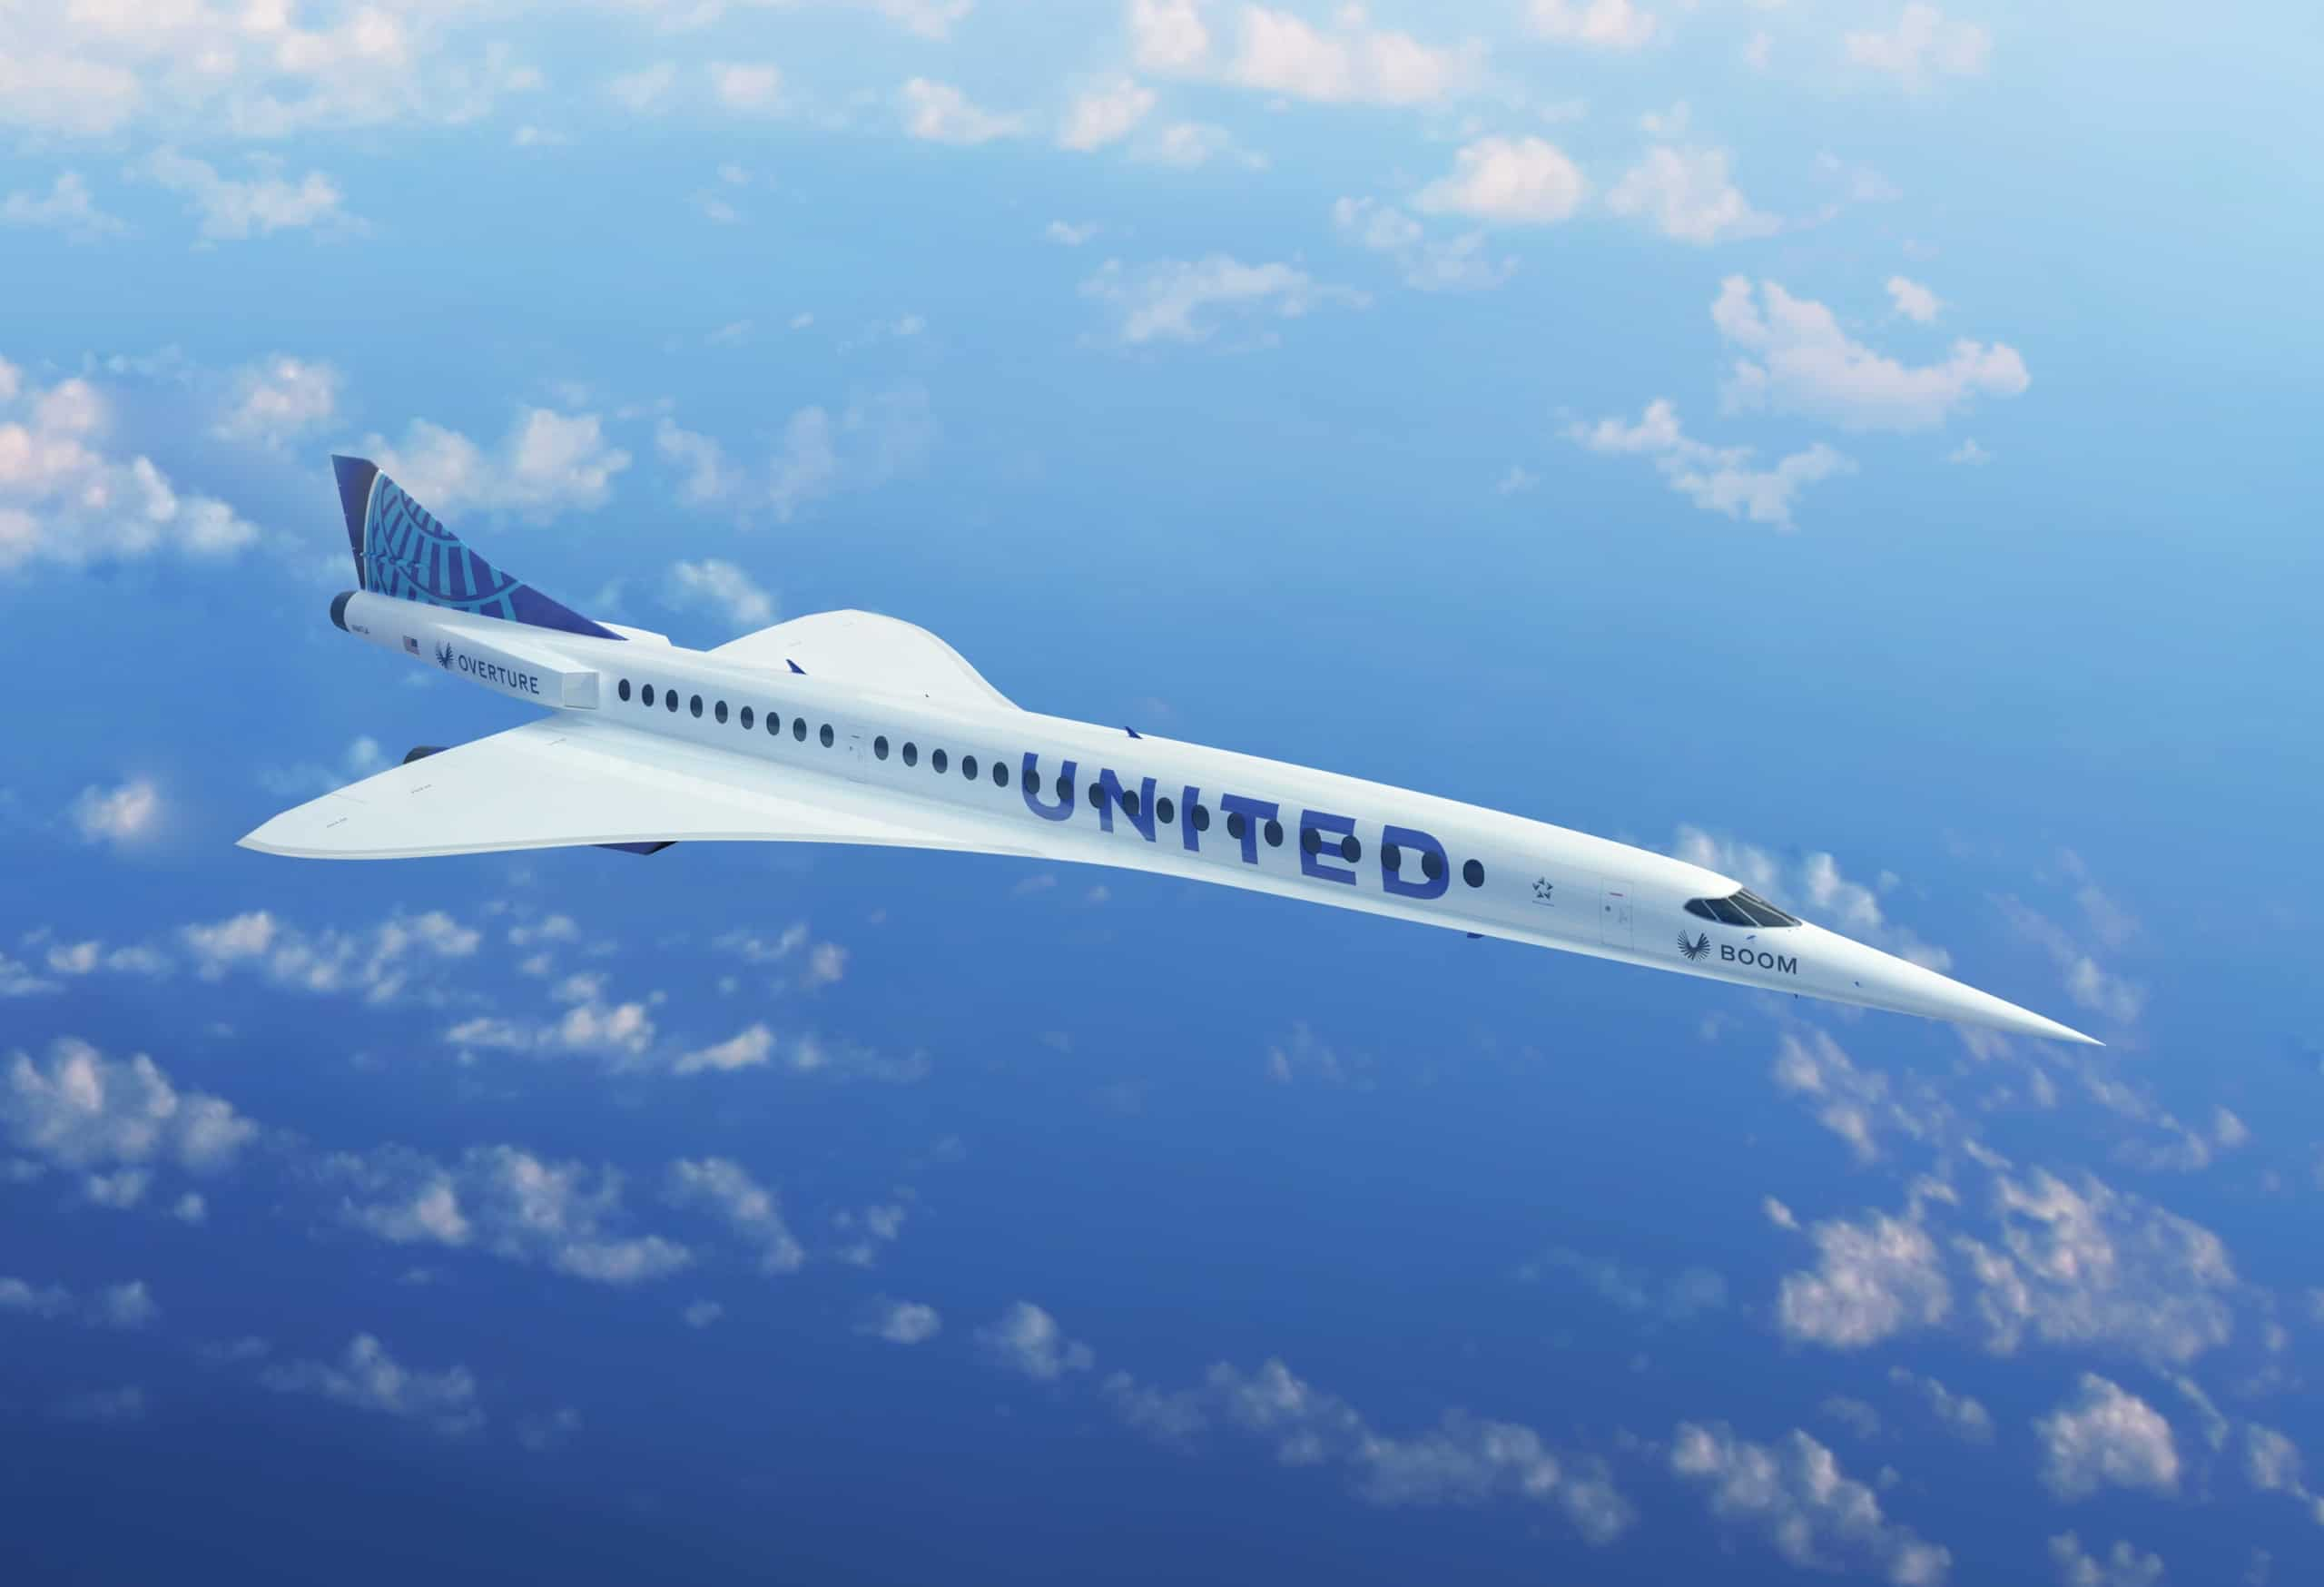 United Arlines Supersonic Plane